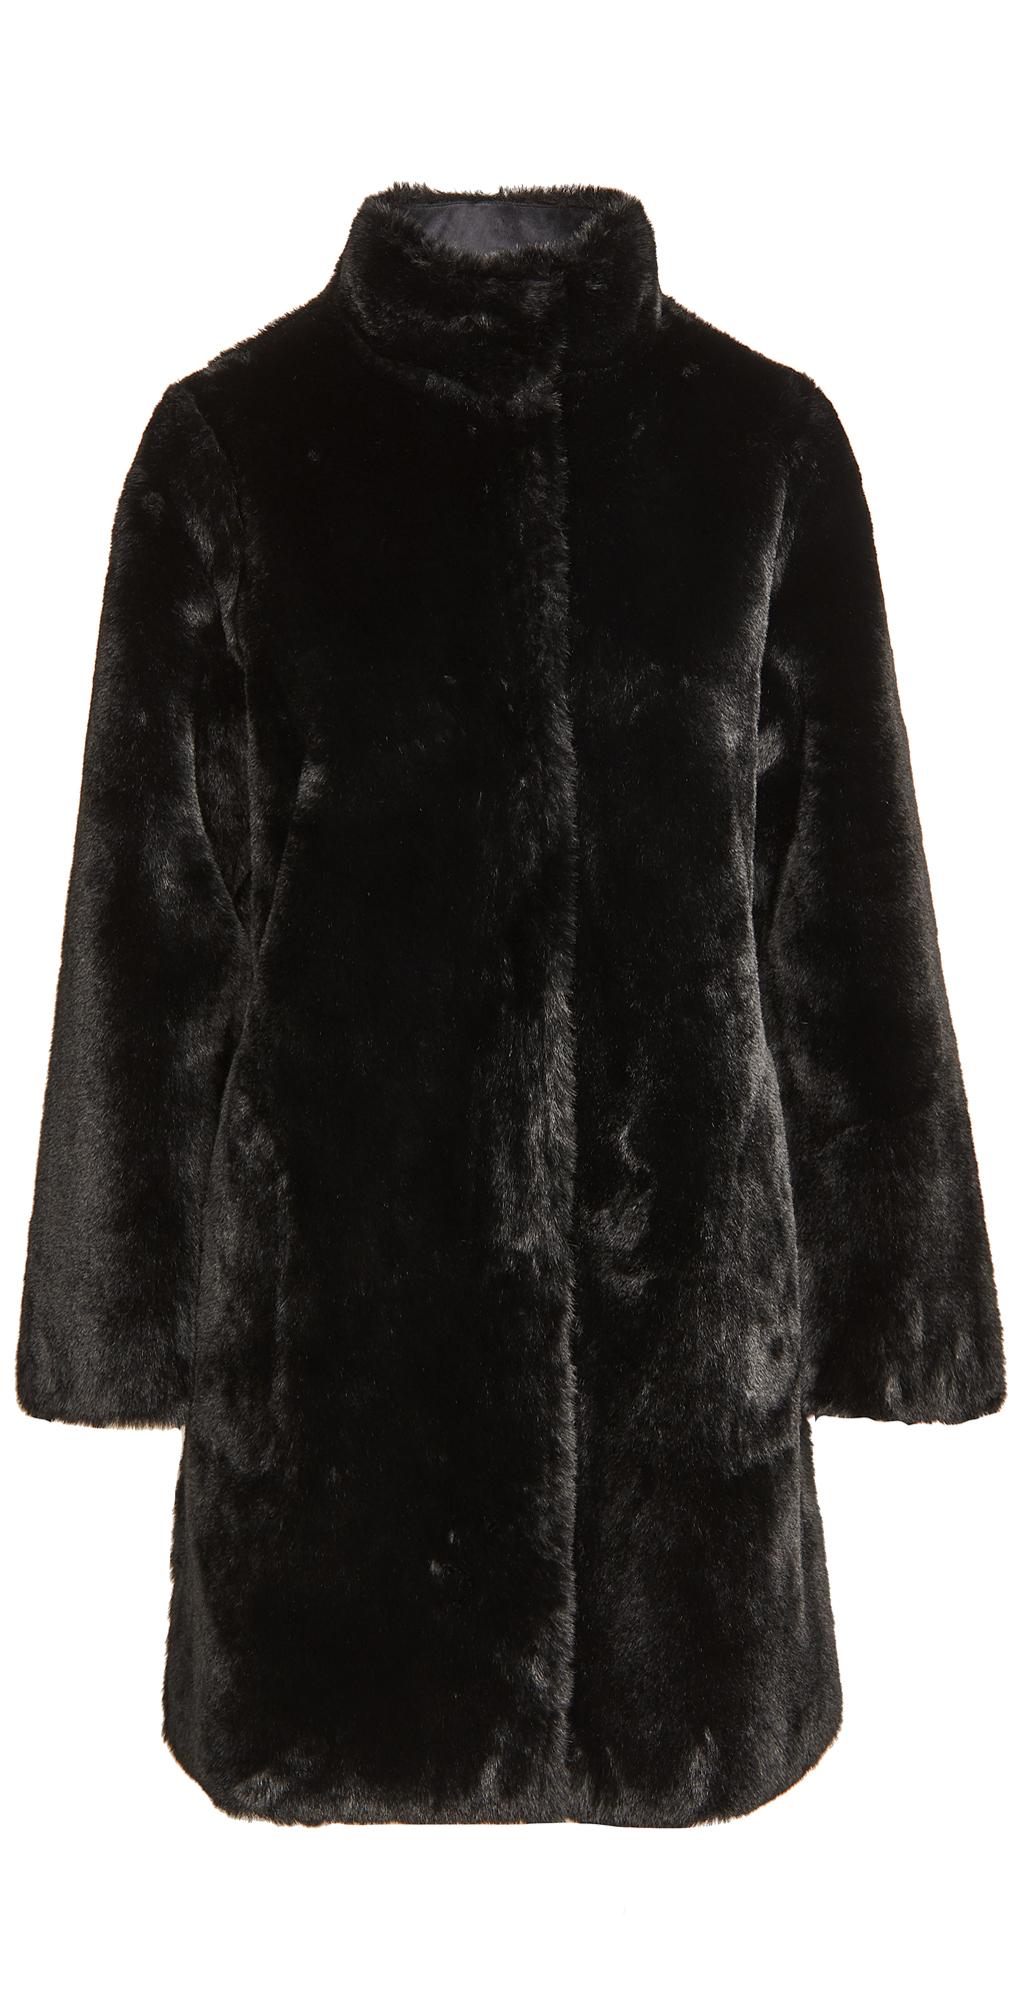 Velvet Mina03 Jacket